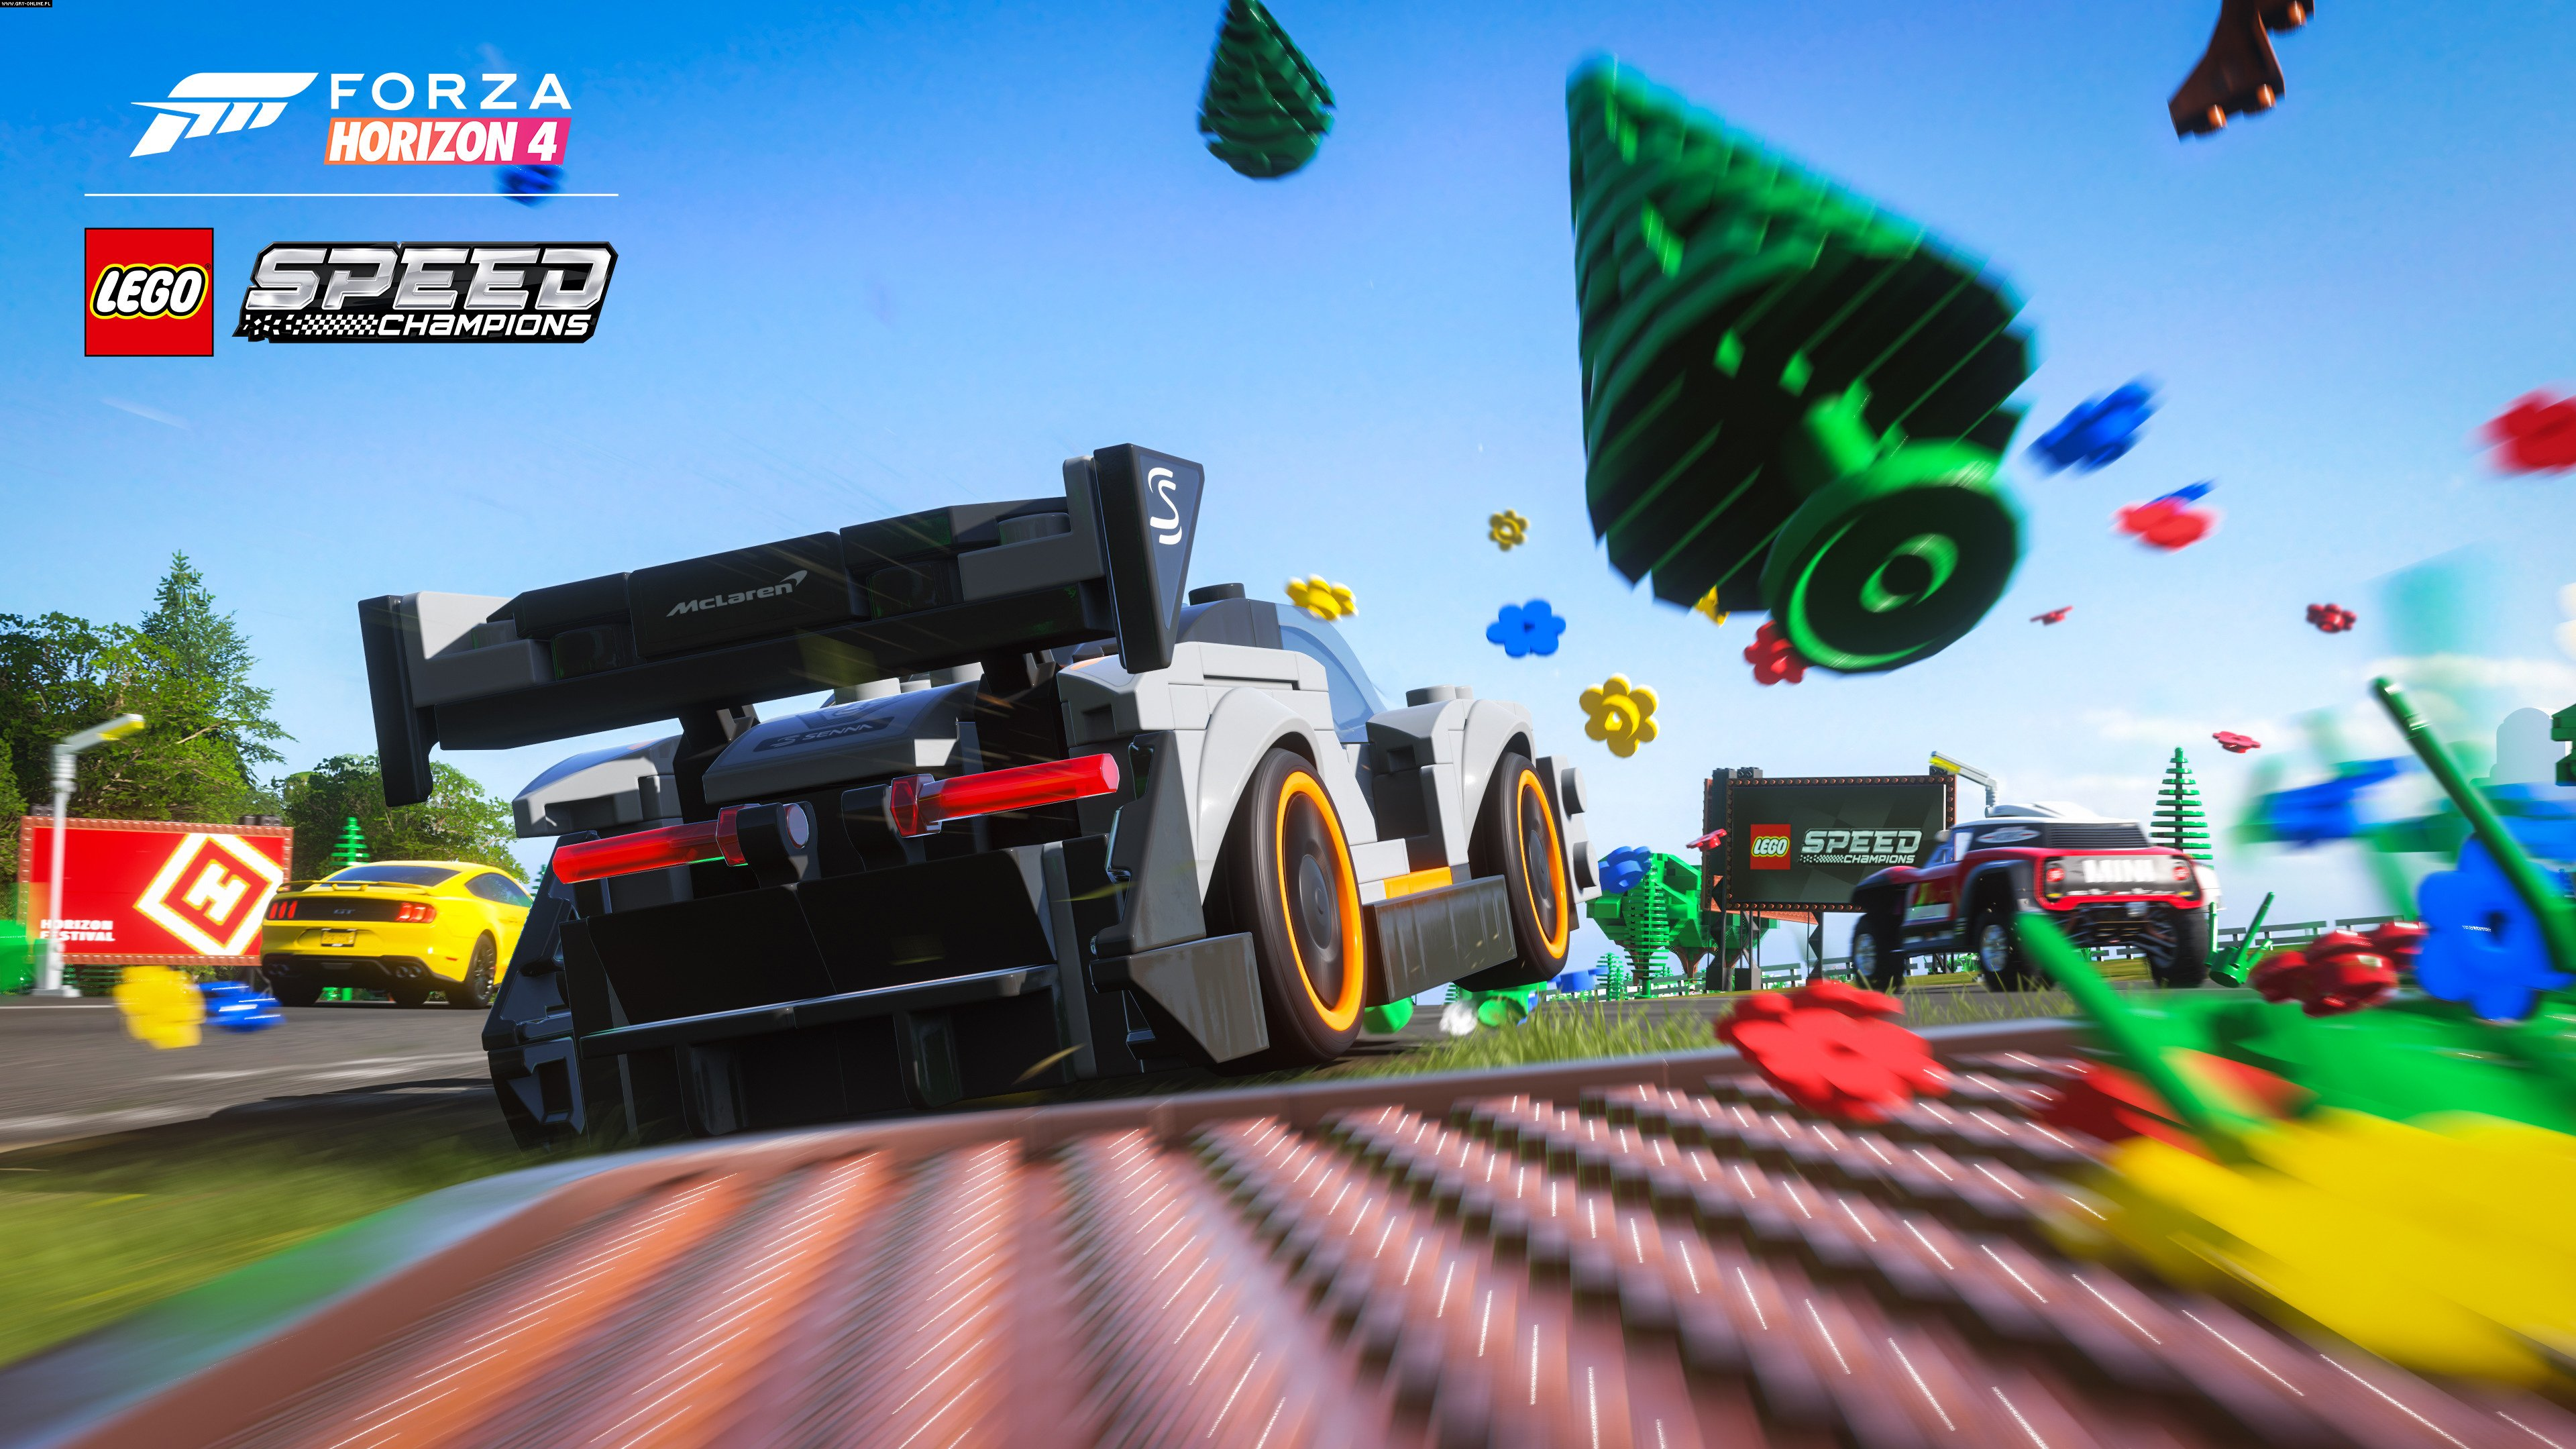 Forza Horizon 4: LEGO Speed Champions PC Download